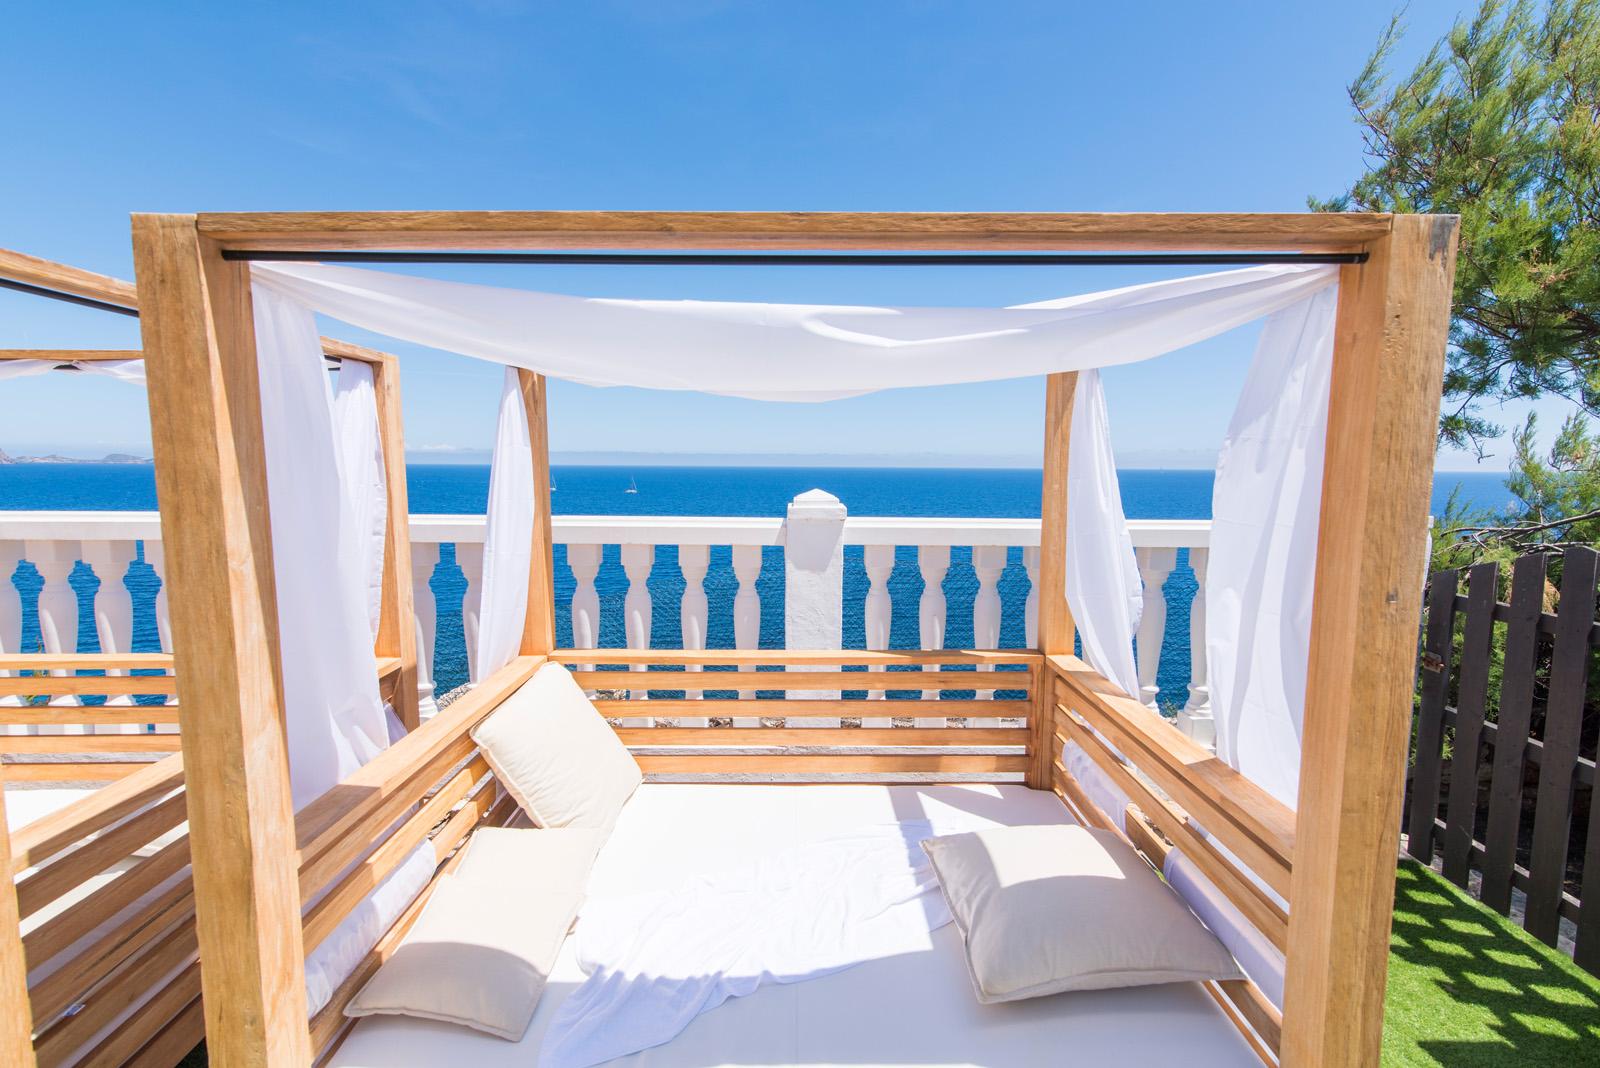 All-Inclusive Hotel In Es Canar, Ibiza  Azuline Club Cala Martina Ibiza-4187